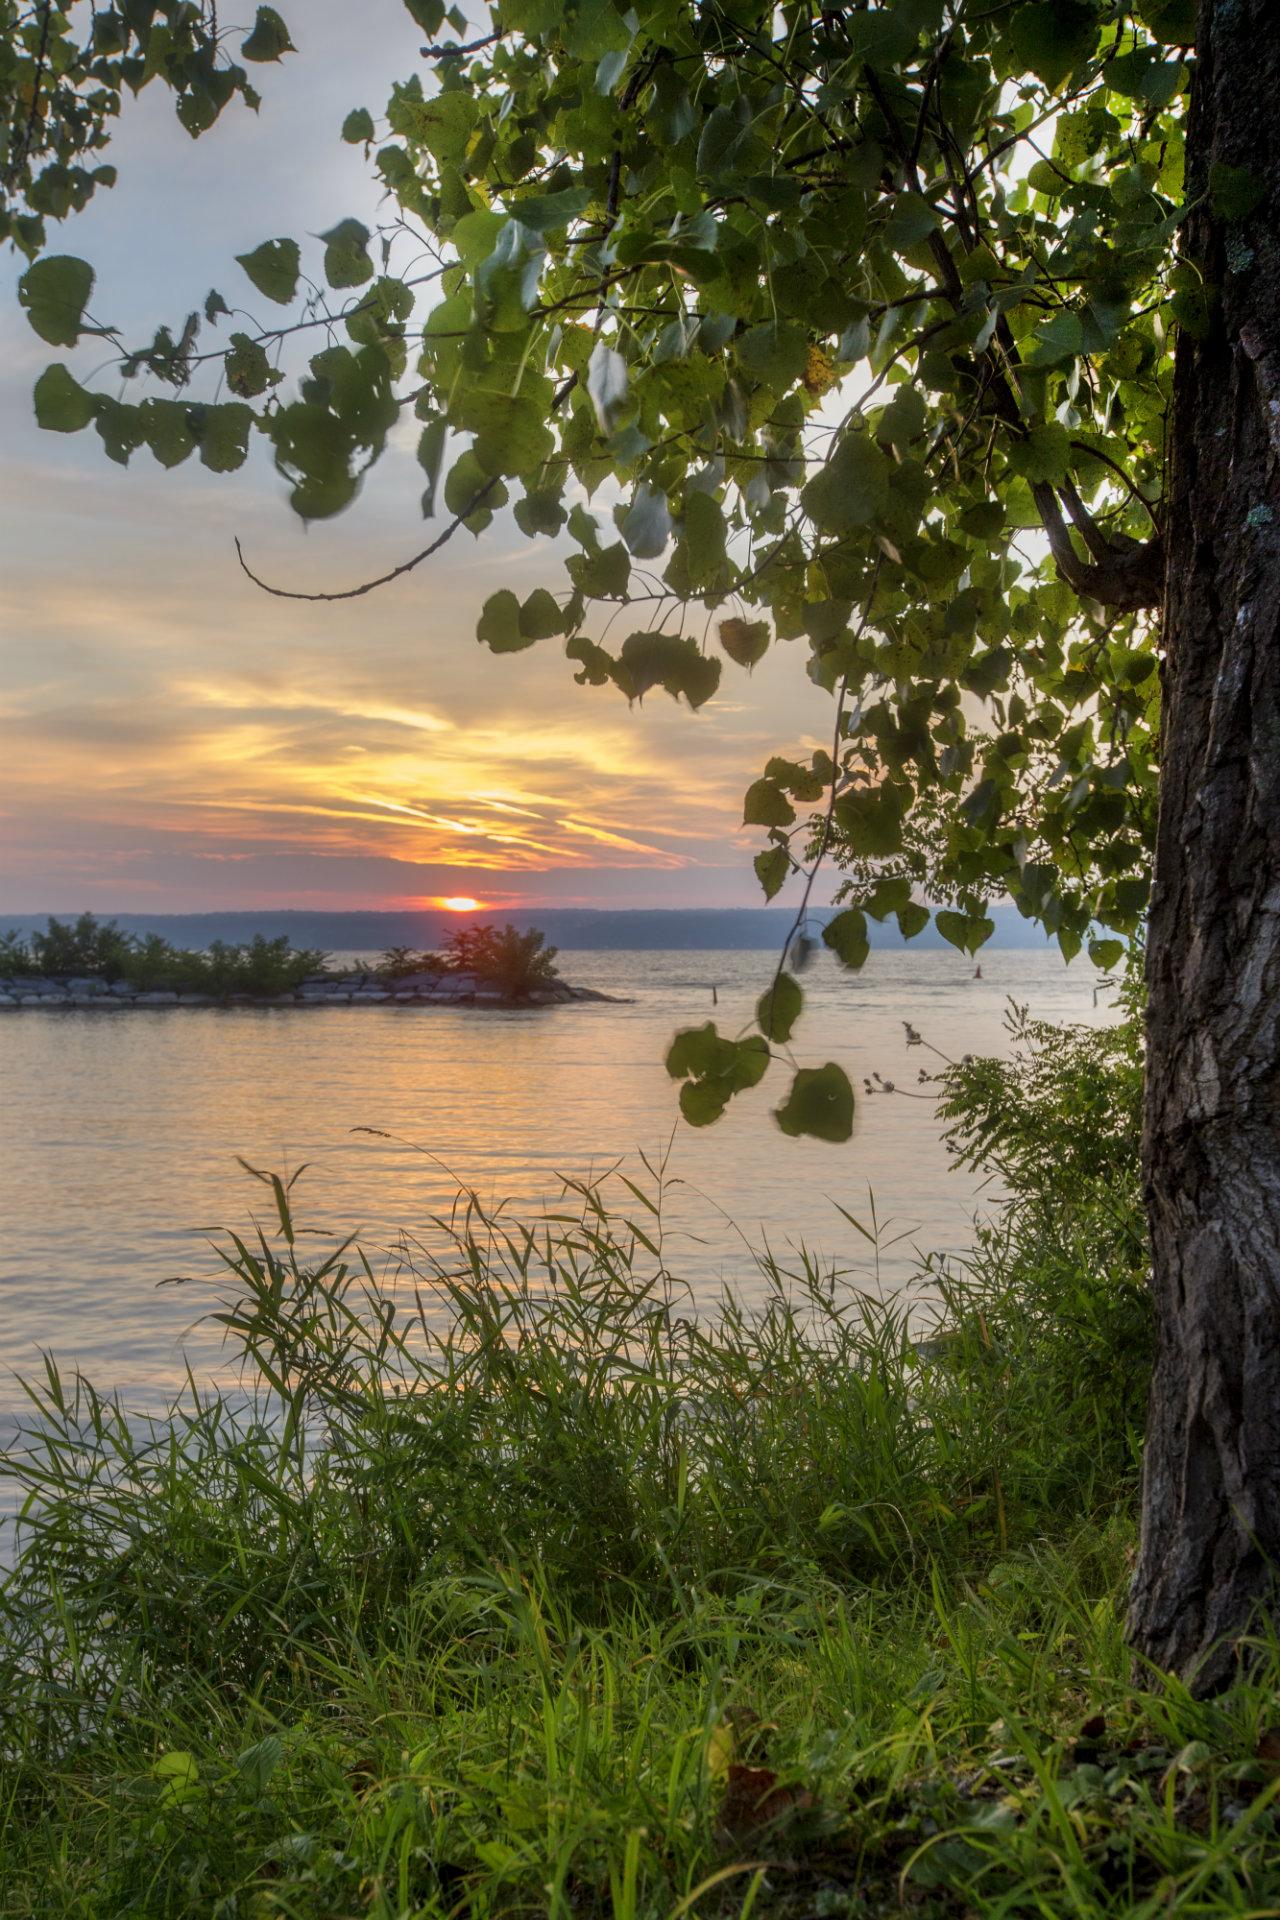 Sunrise at Deans Cove (photo)